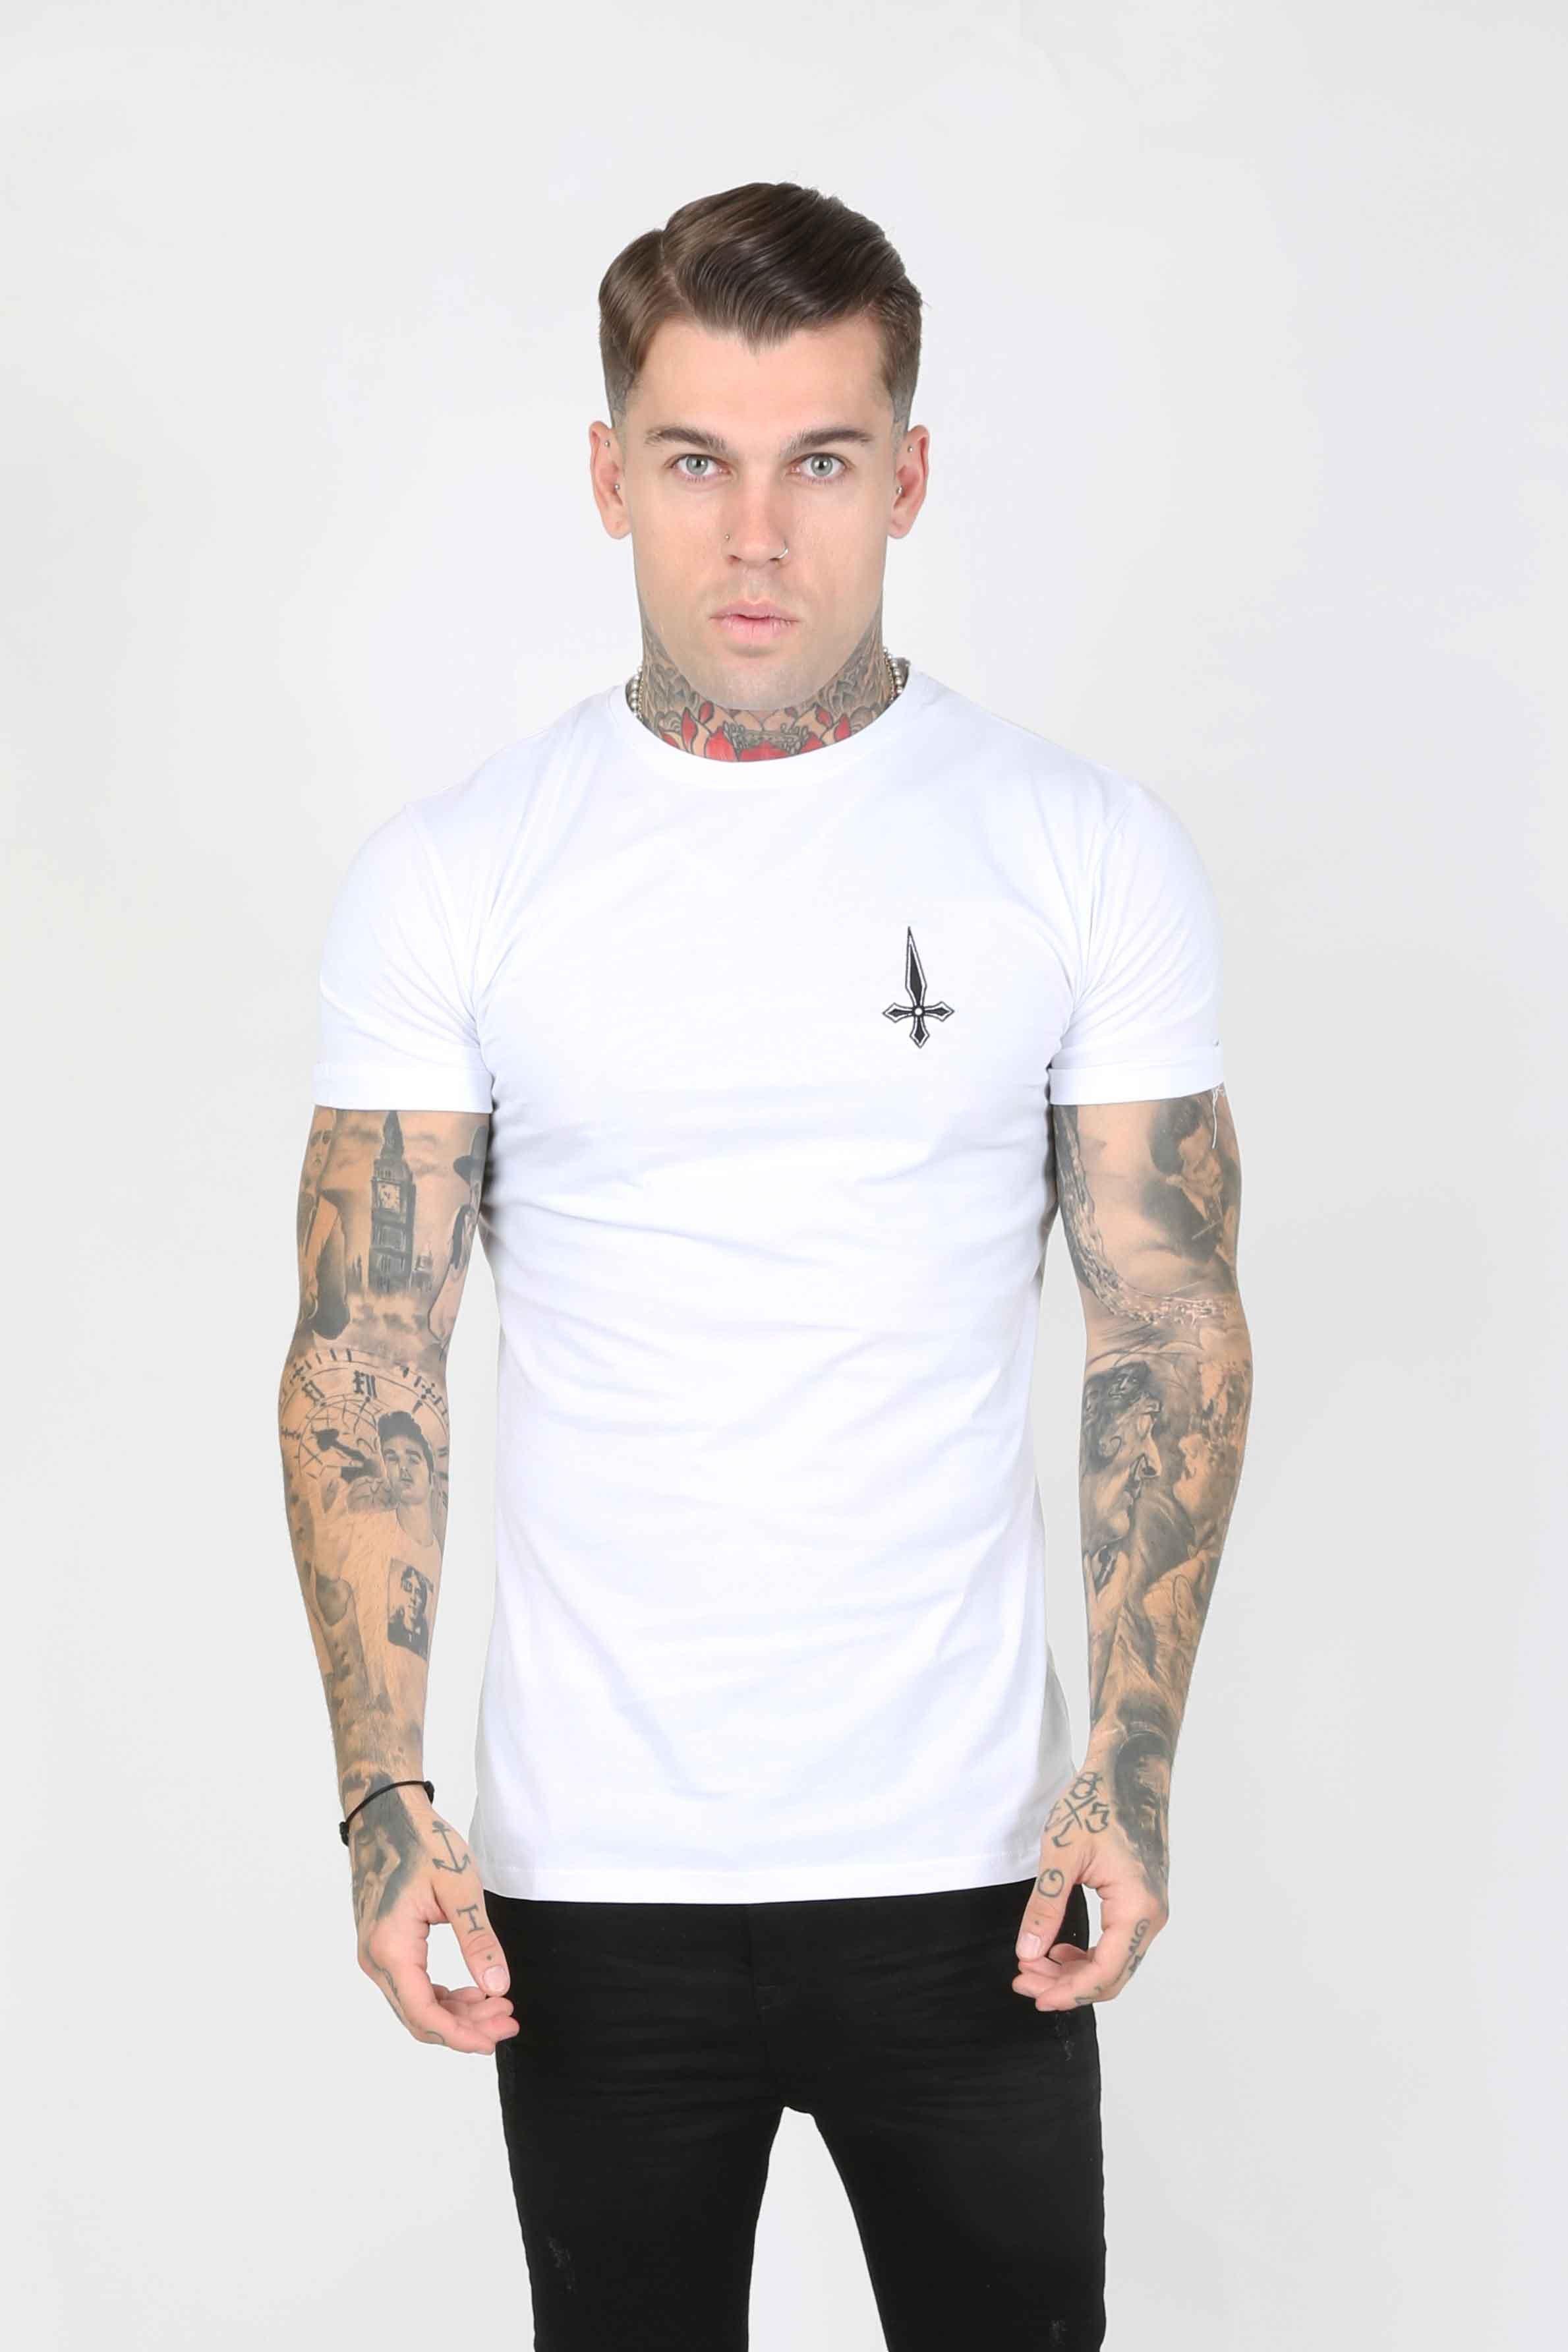 Core Twinpack Men's T-Shirt - White/Grey, Small